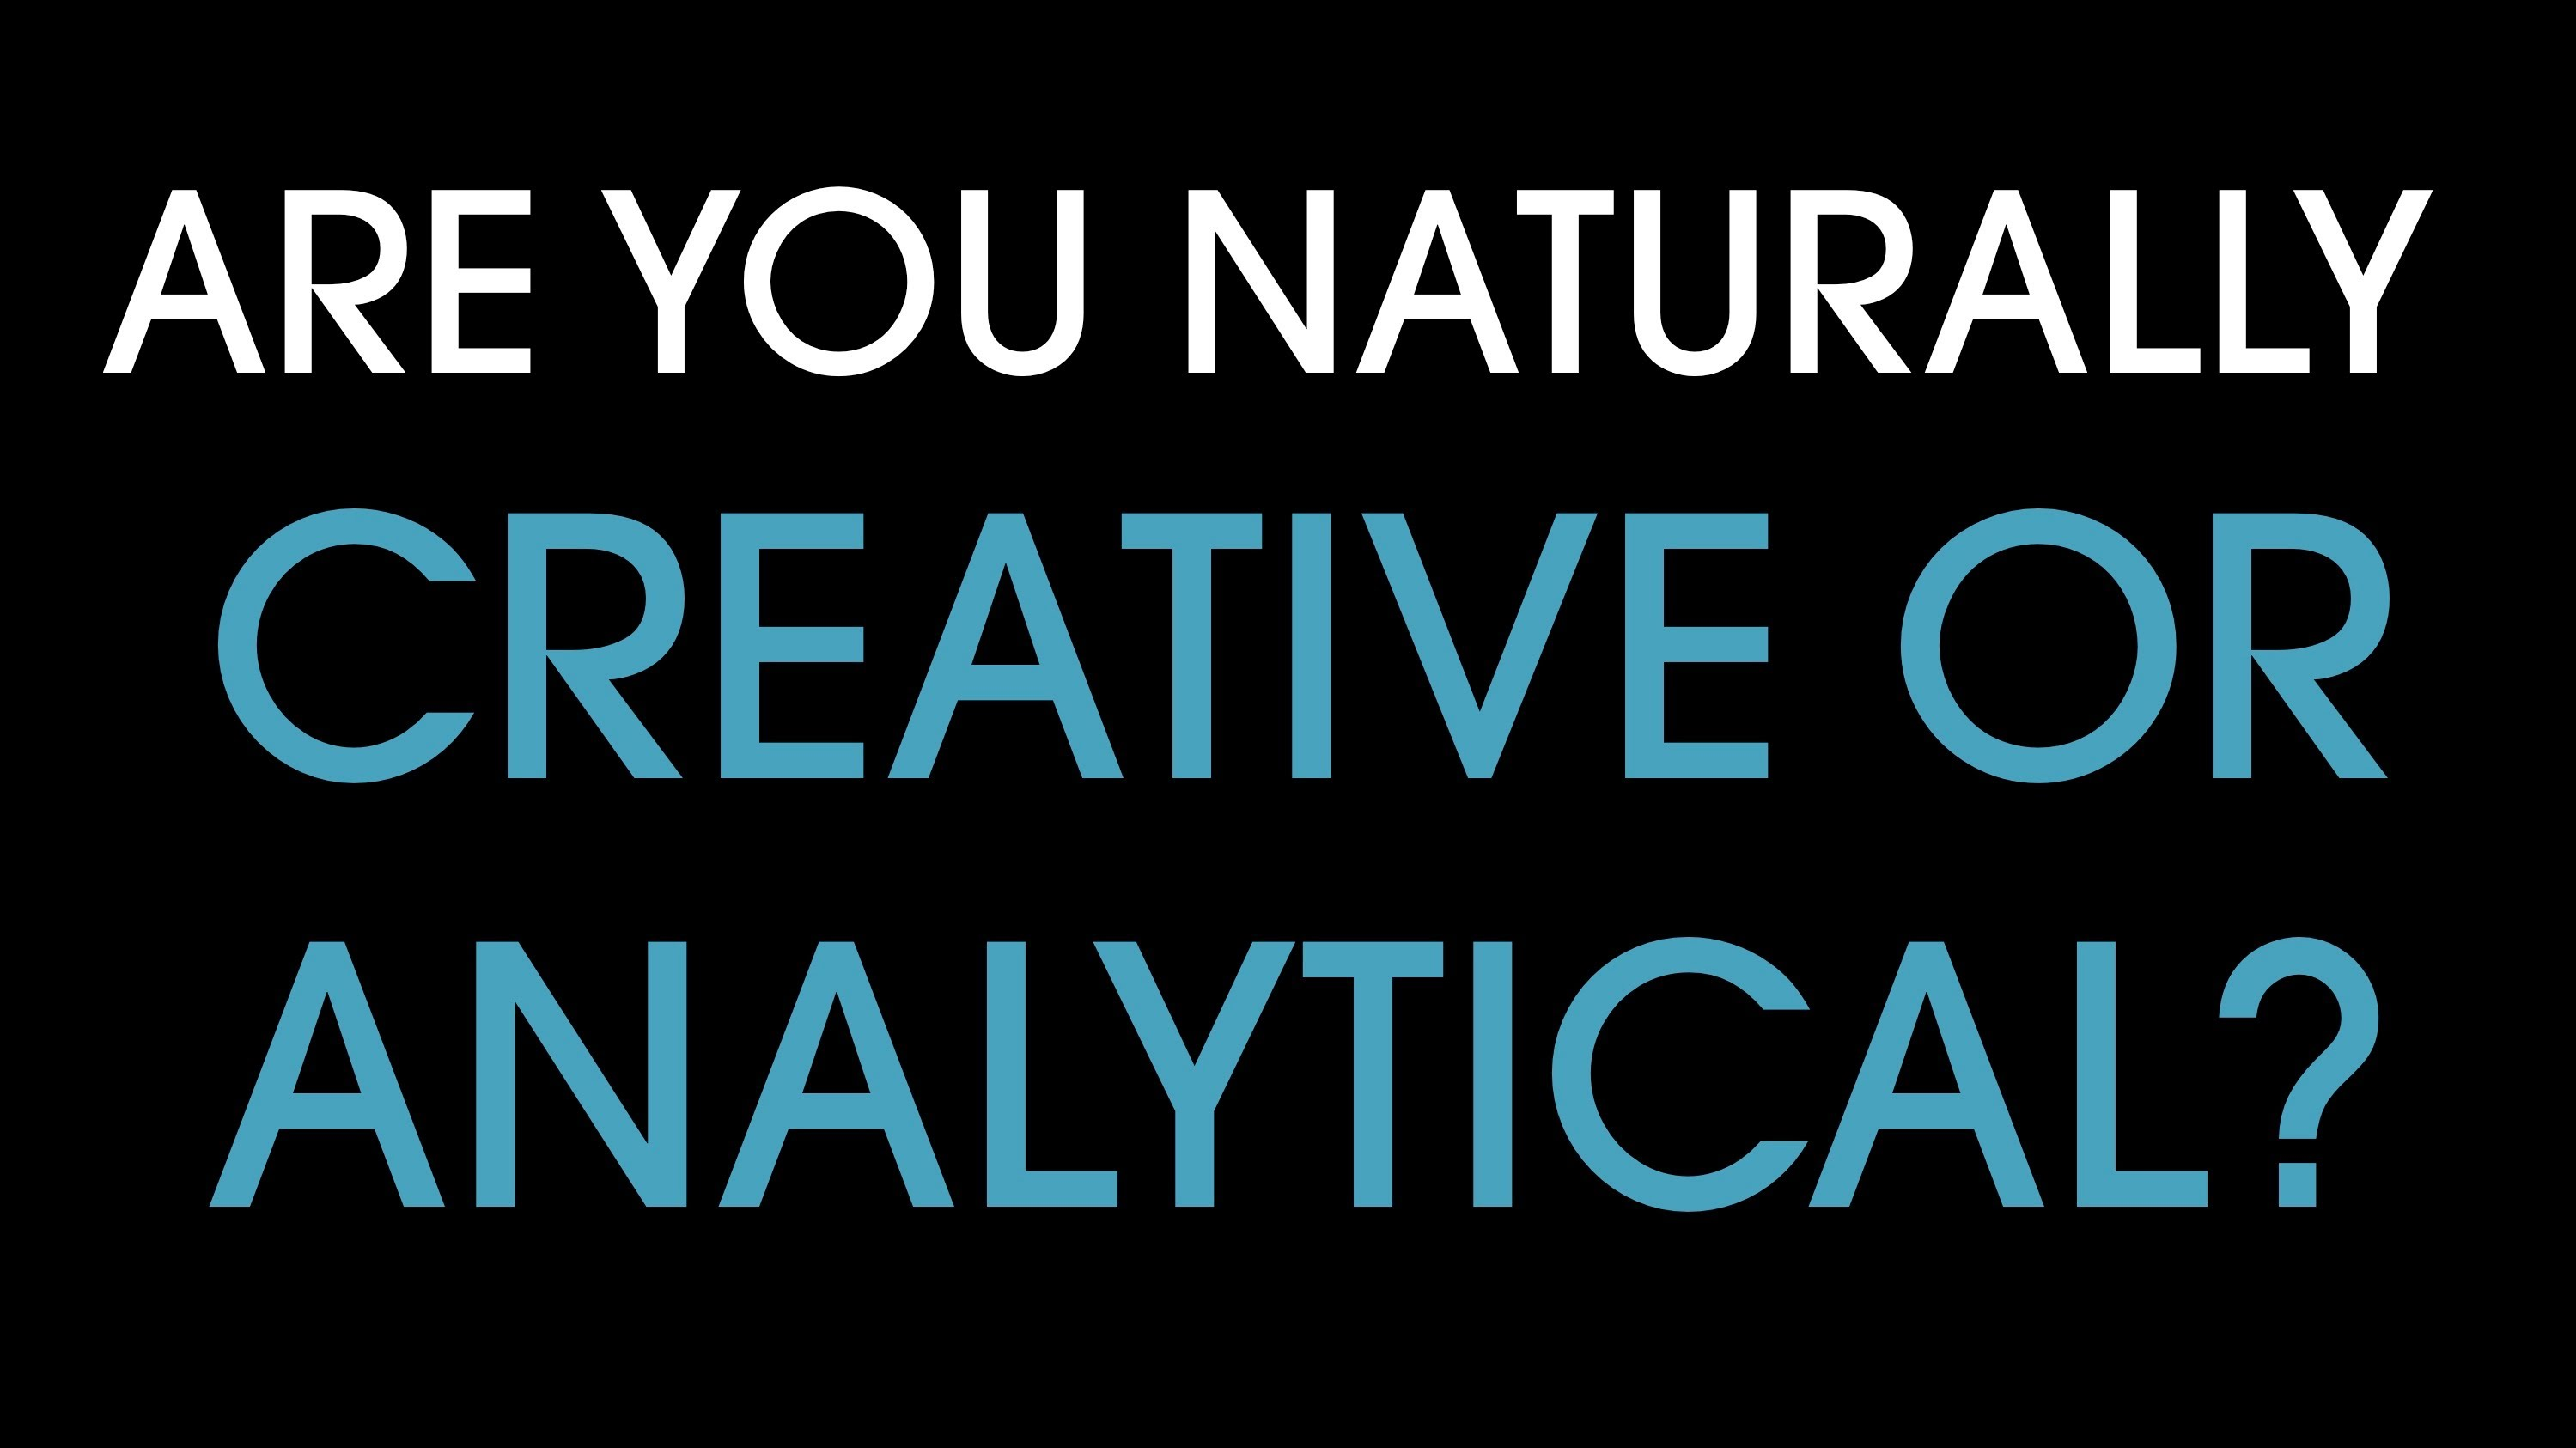 「小測驗!你是感性人還是理性人?」- Are You Creative or Analytical?